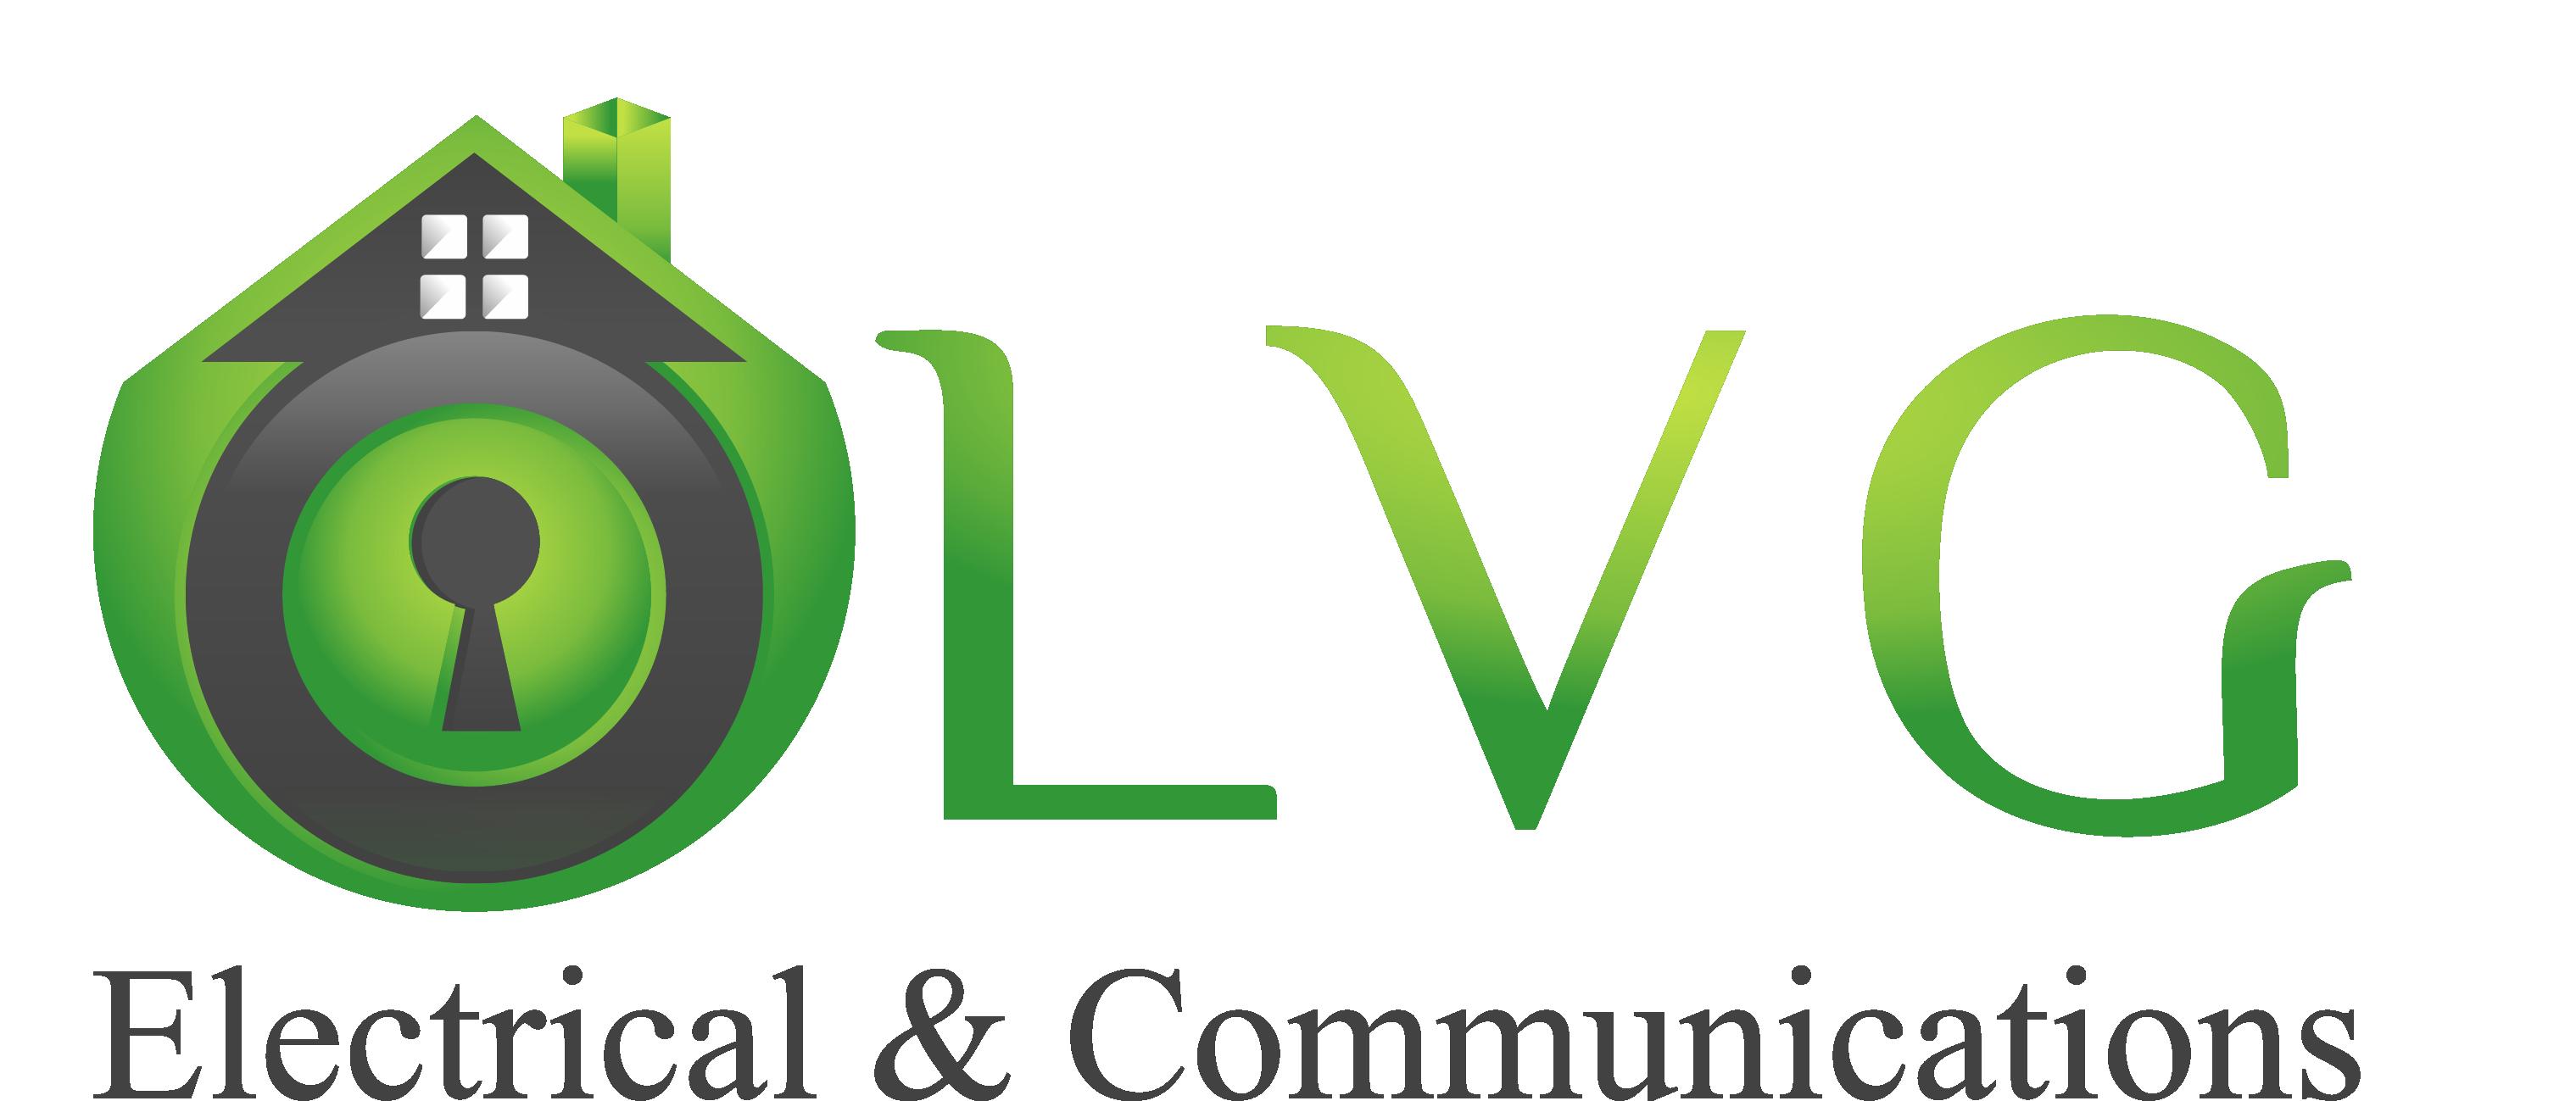 Lowvg Logo